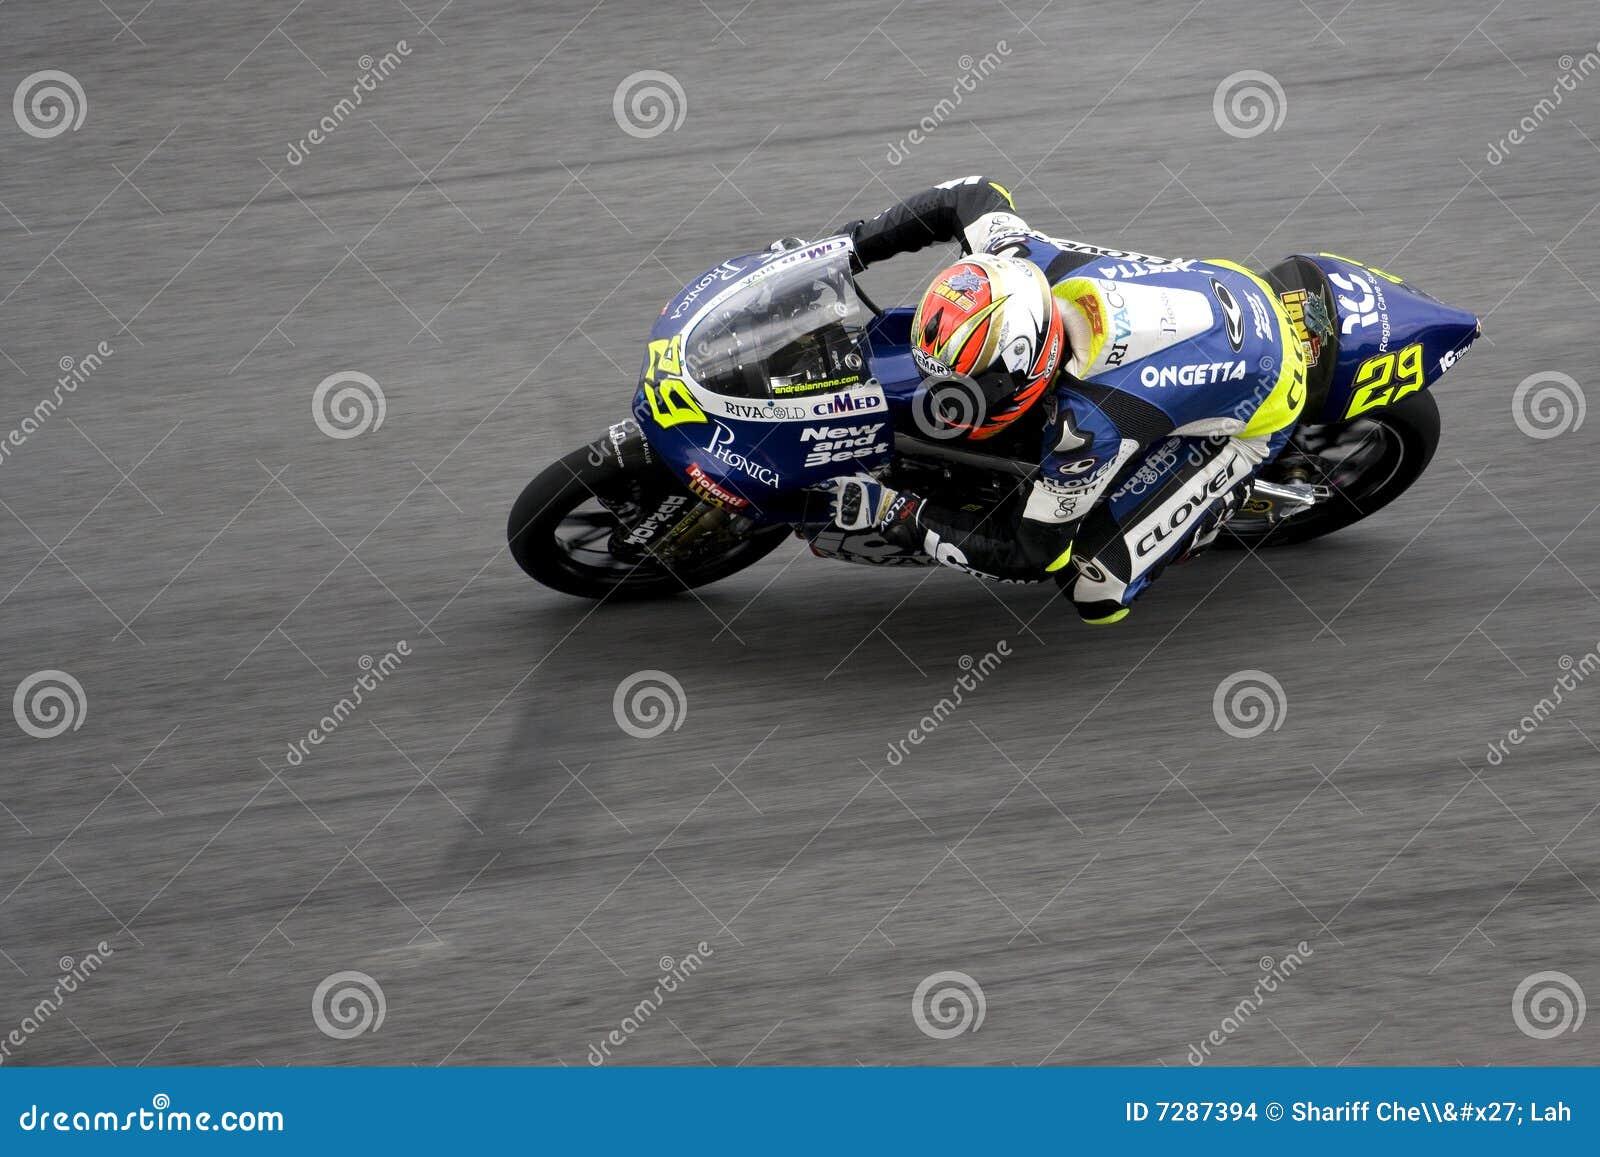 Motogp 125cc - Andrea Iannone